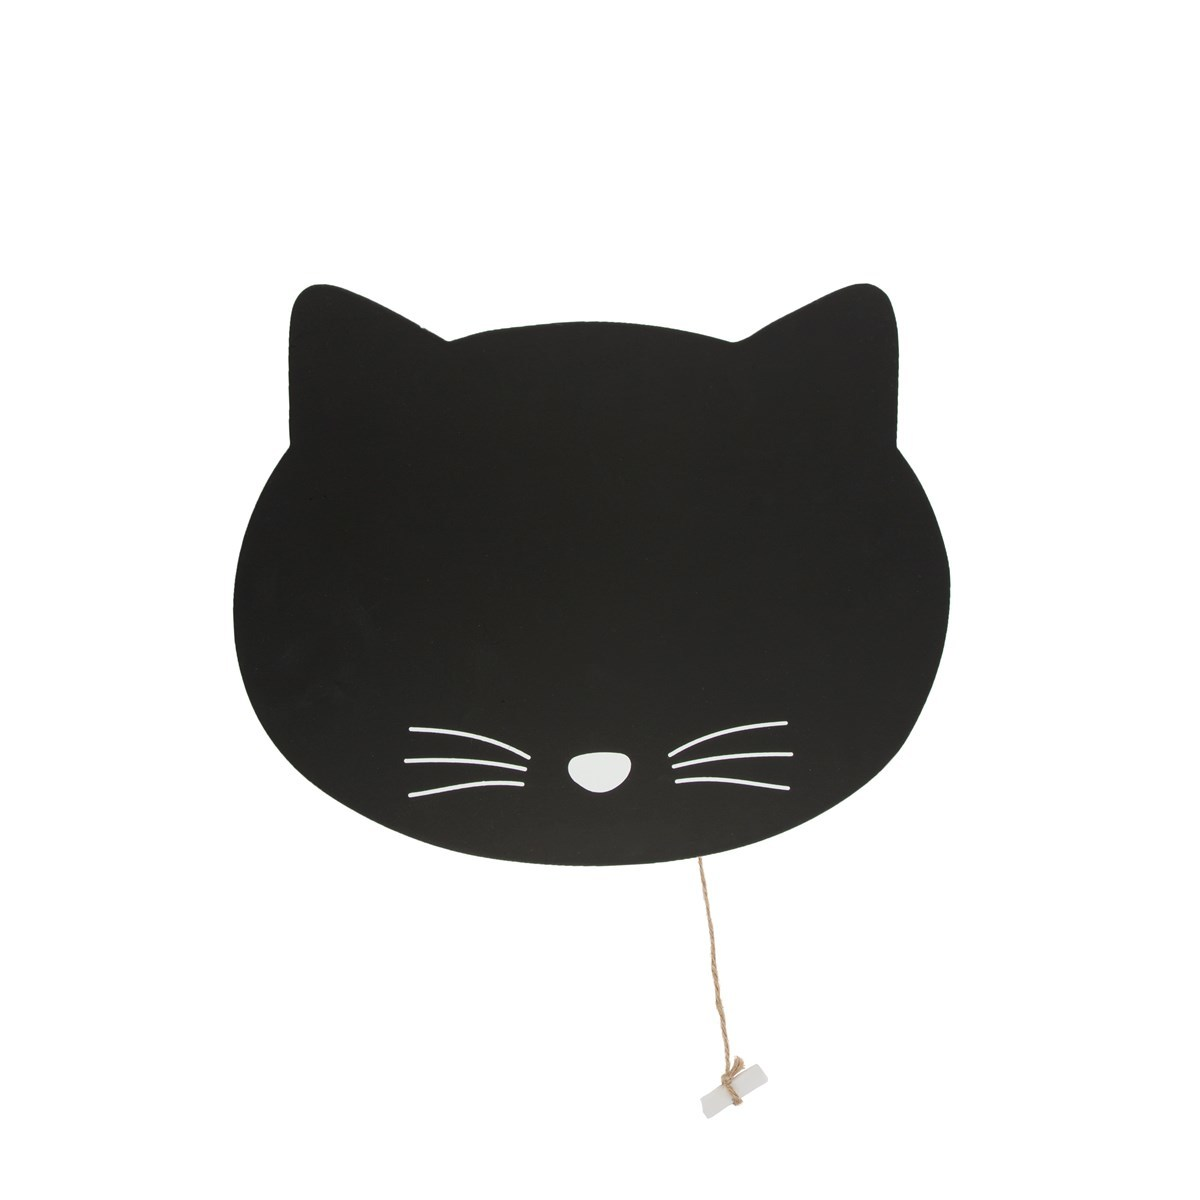 Black Cat Chalkboard image